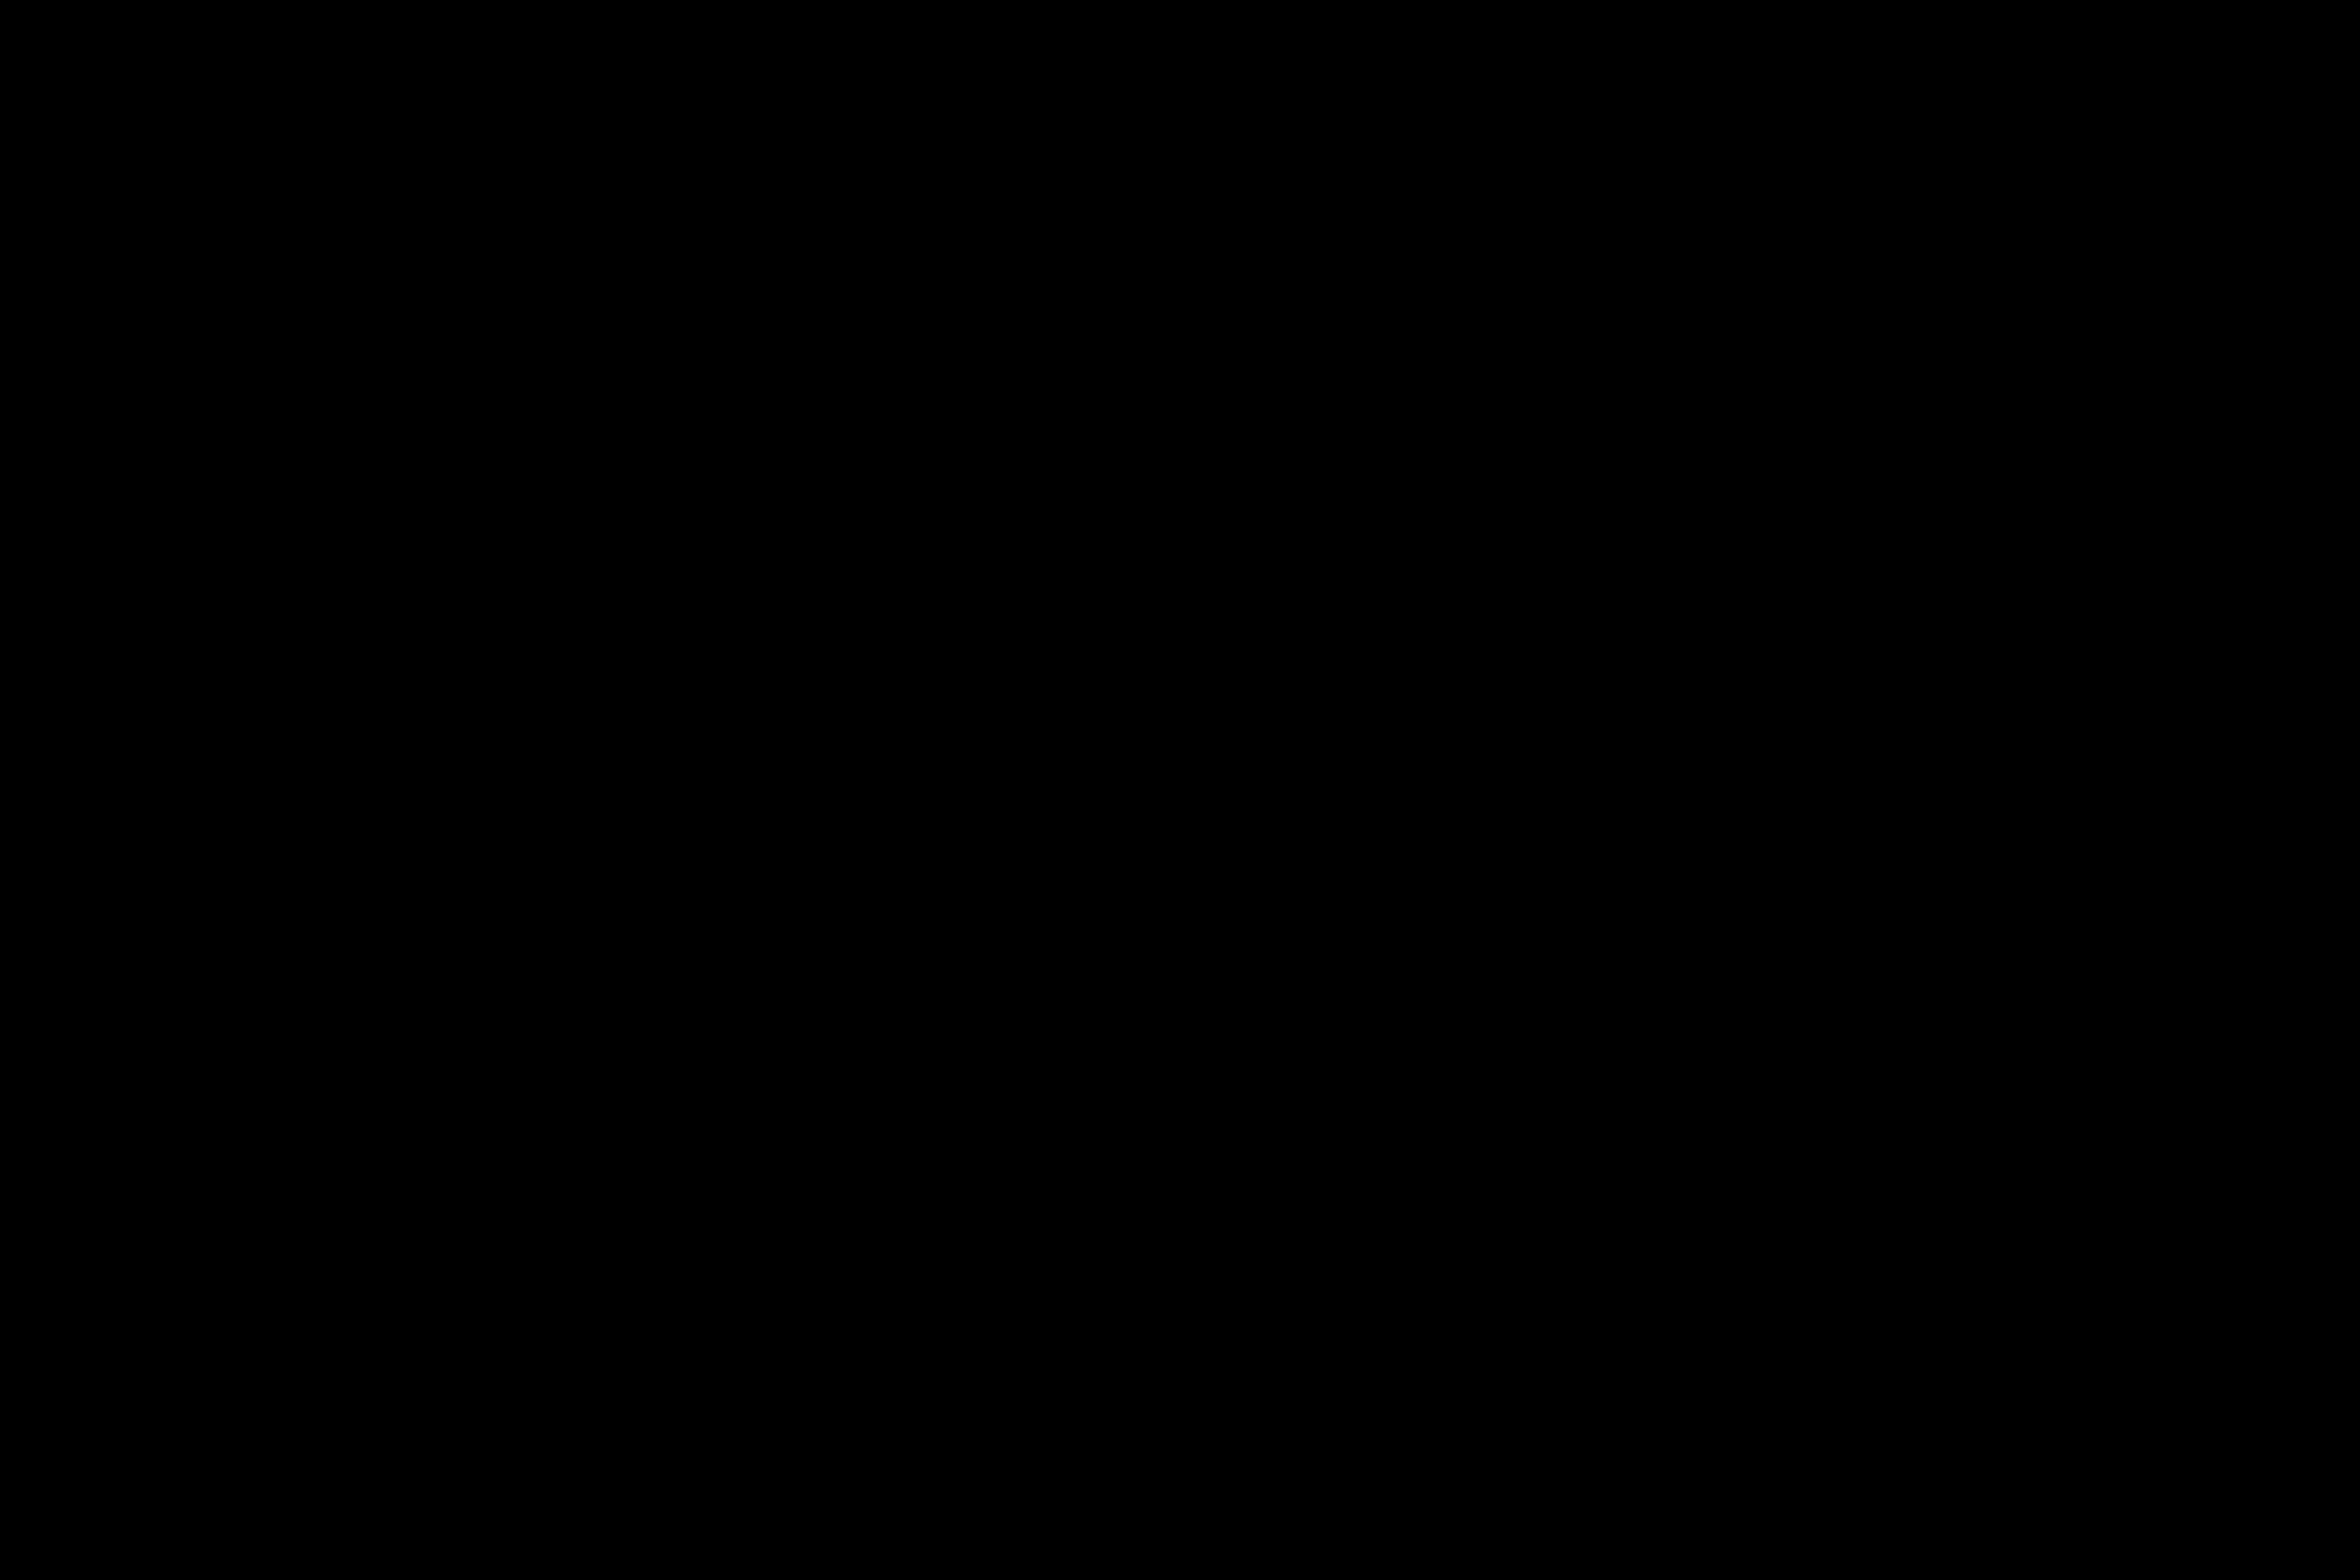 kichererbsen 3